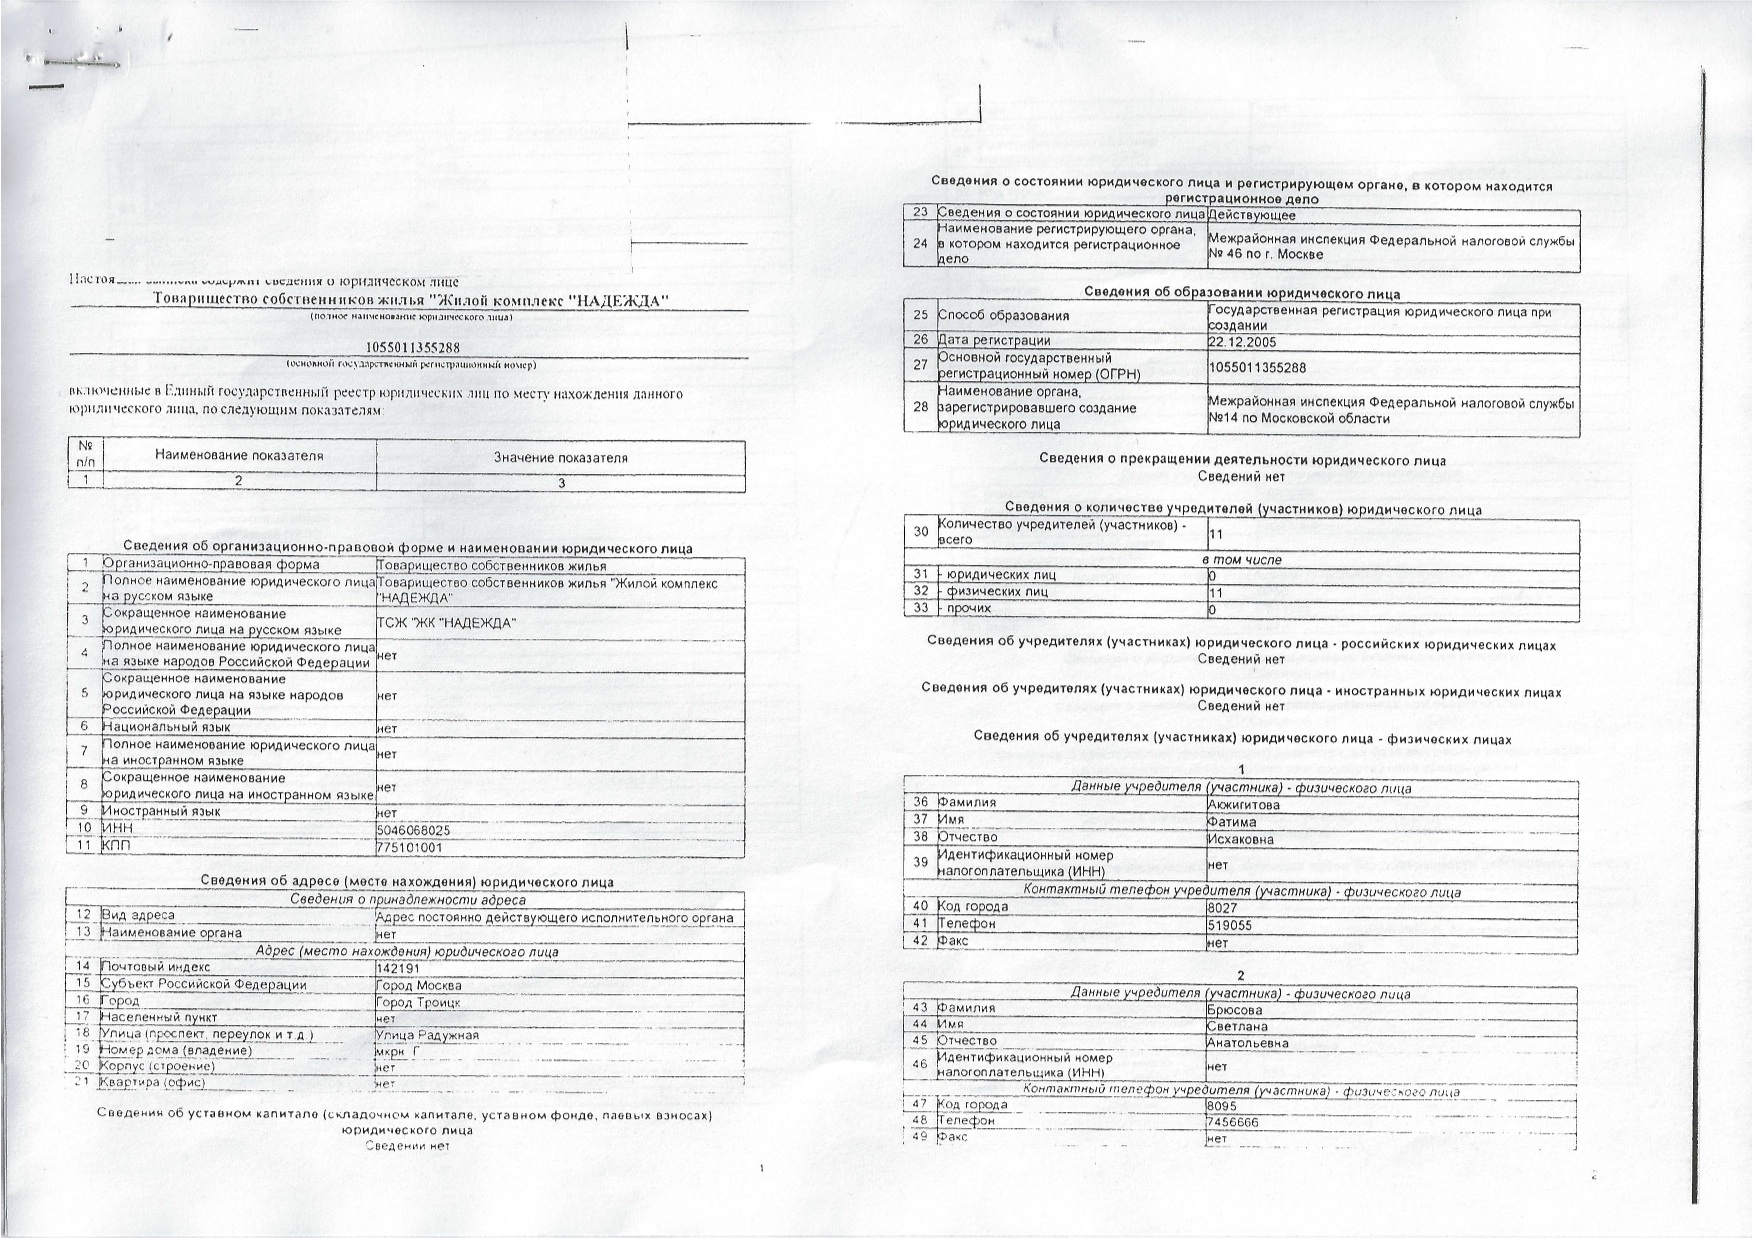 scan - копия 5